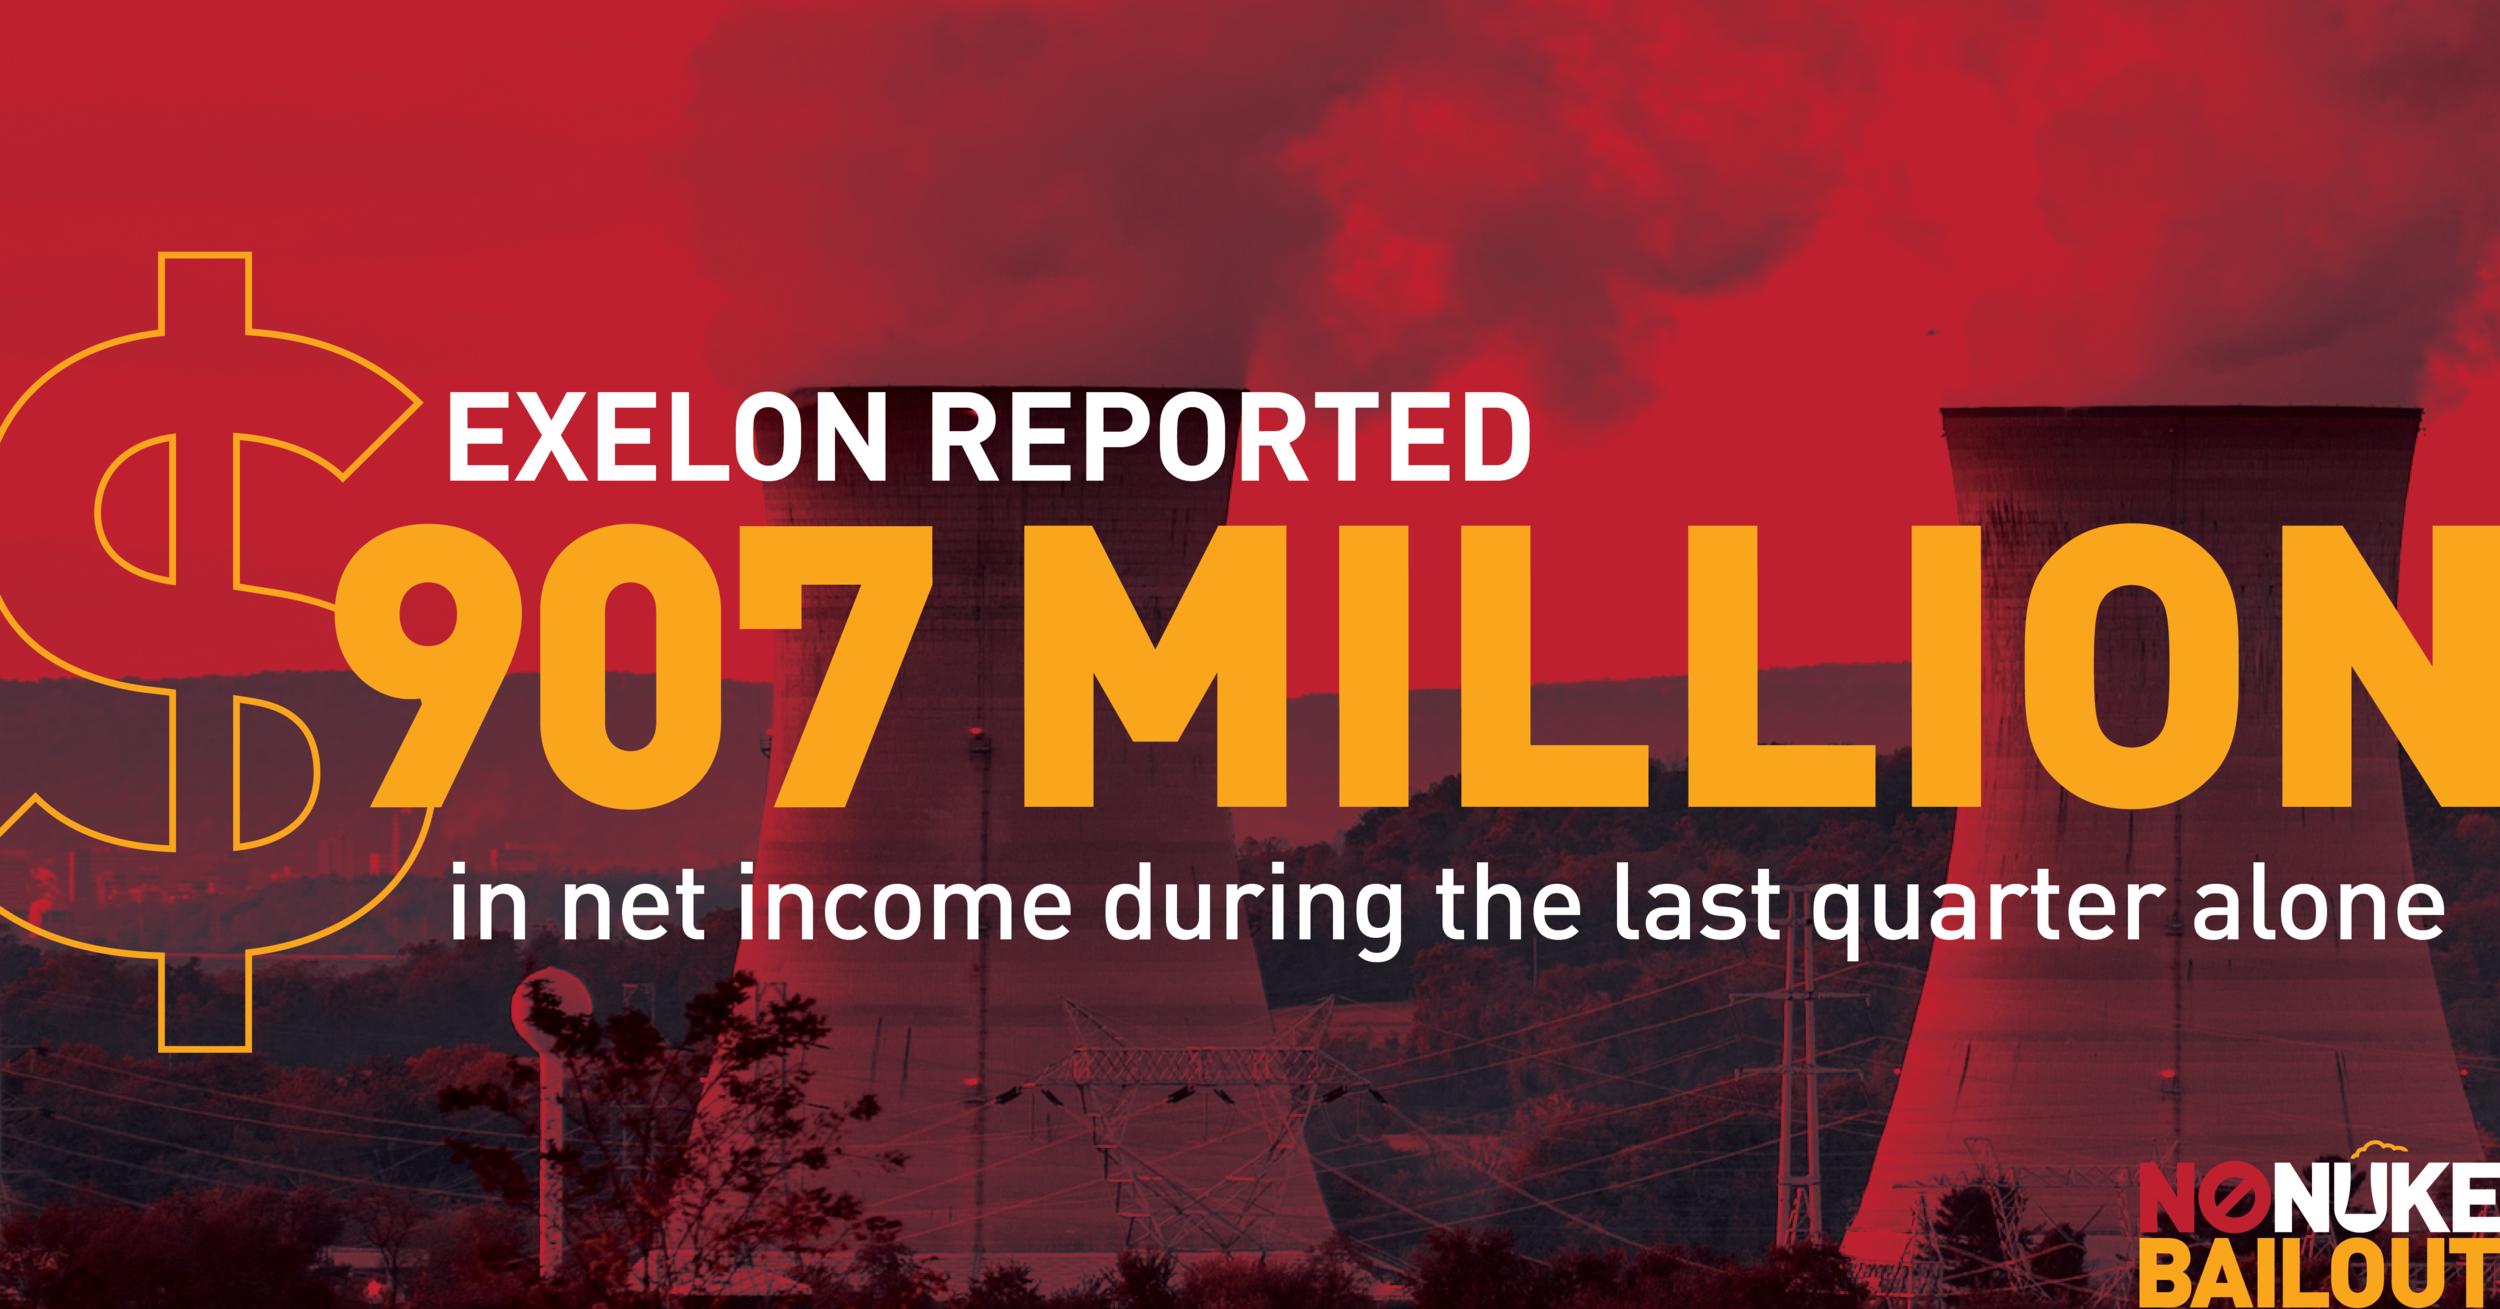 Exelon is seeking a nuclear bailout in PA despite earning $907 million in profits in Q1 2019.